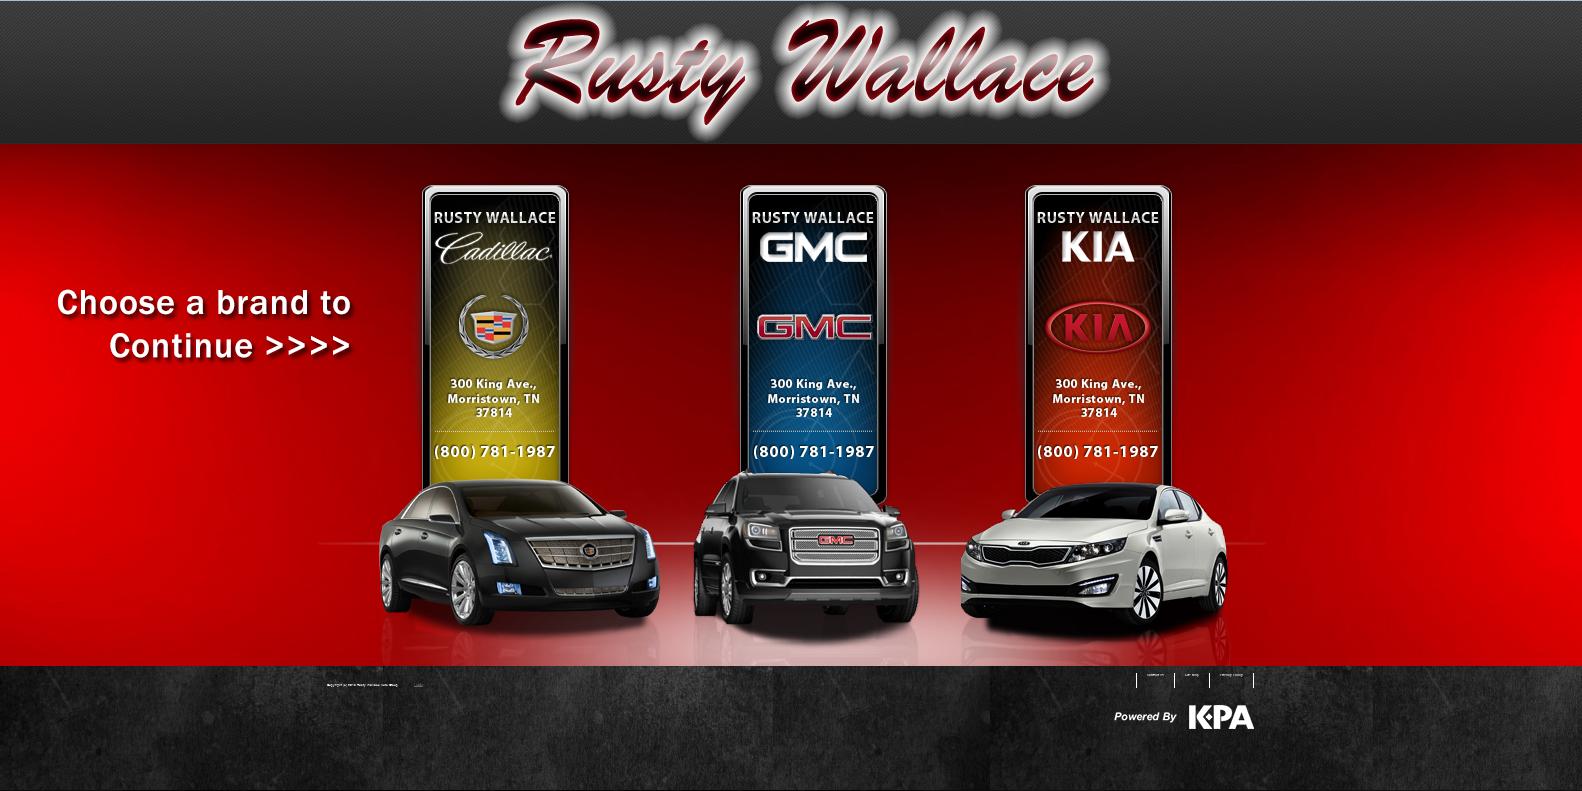 Rusty Wallace Cadillac GMC Kia | New U0026 Used Car Dealer Morristown TN | Used  Car Dealership Johnson City.